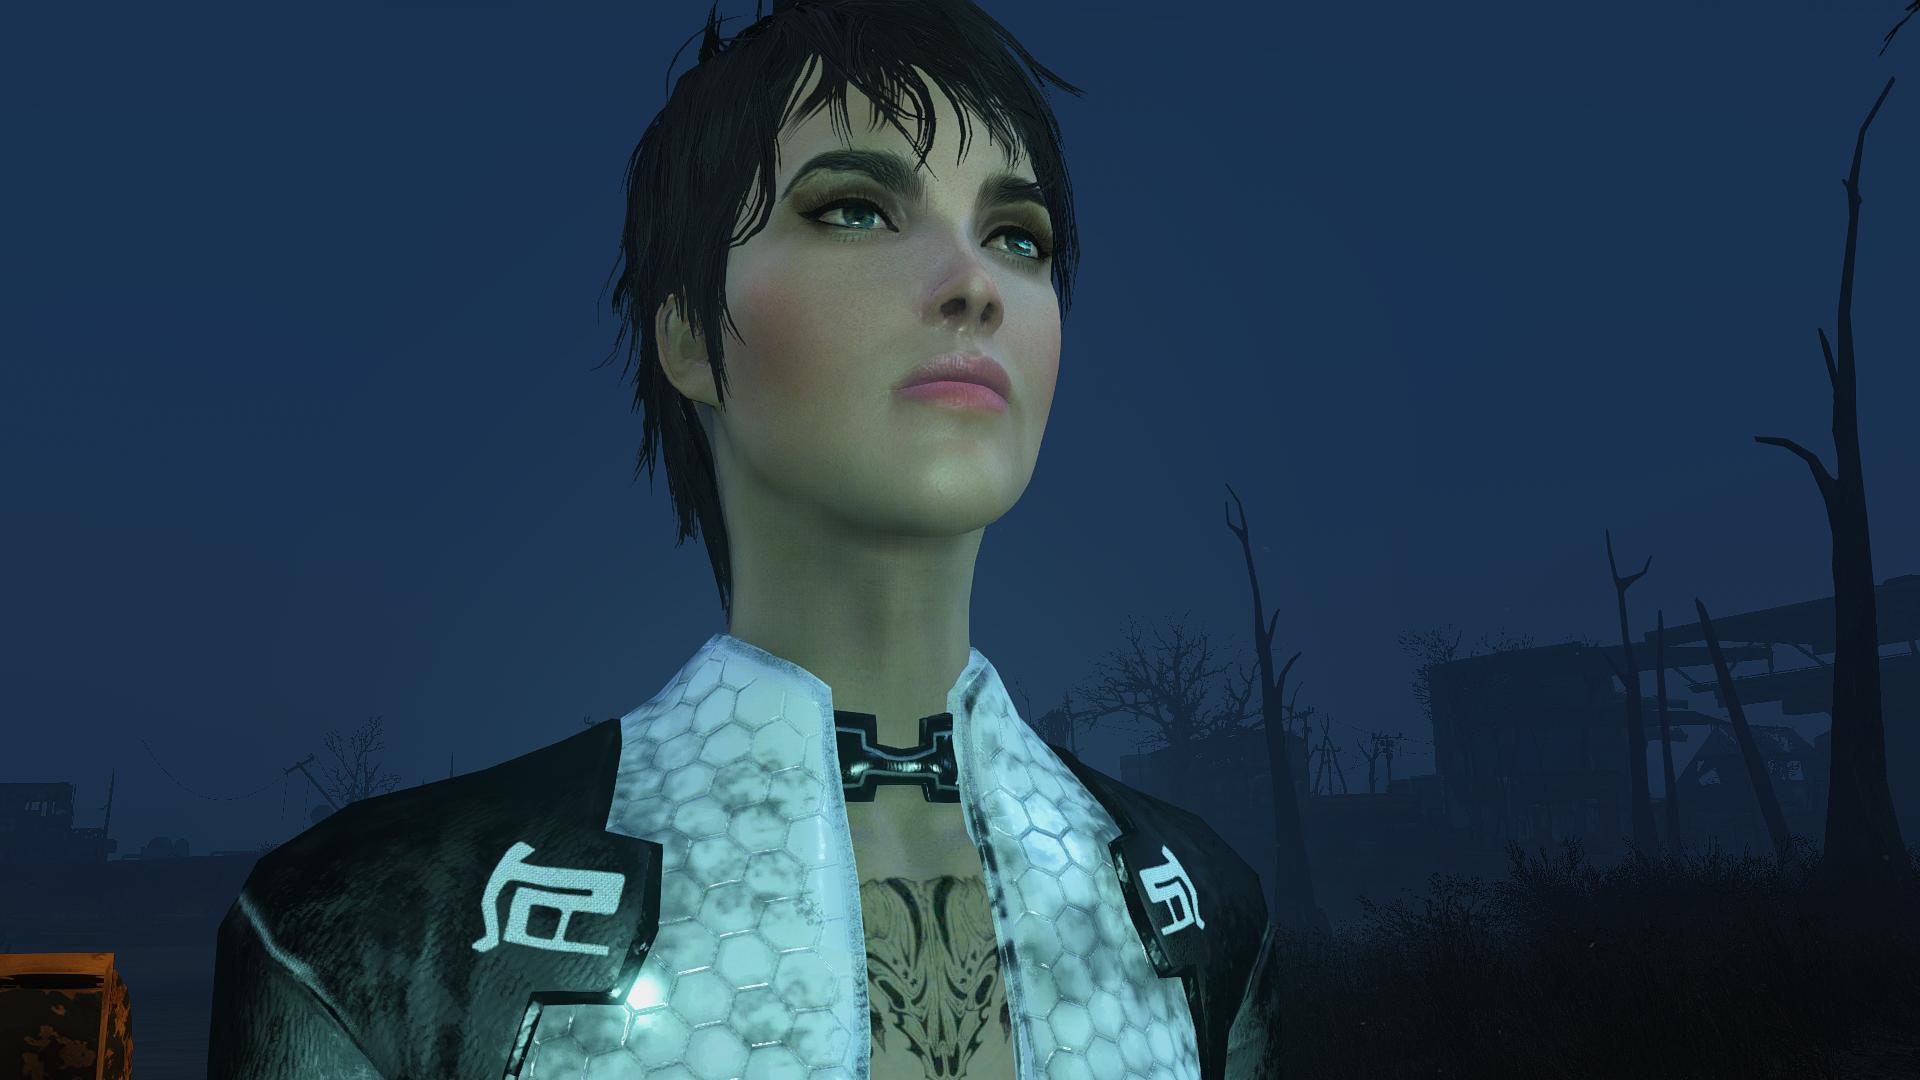 000501.Jpg - Fallout 4